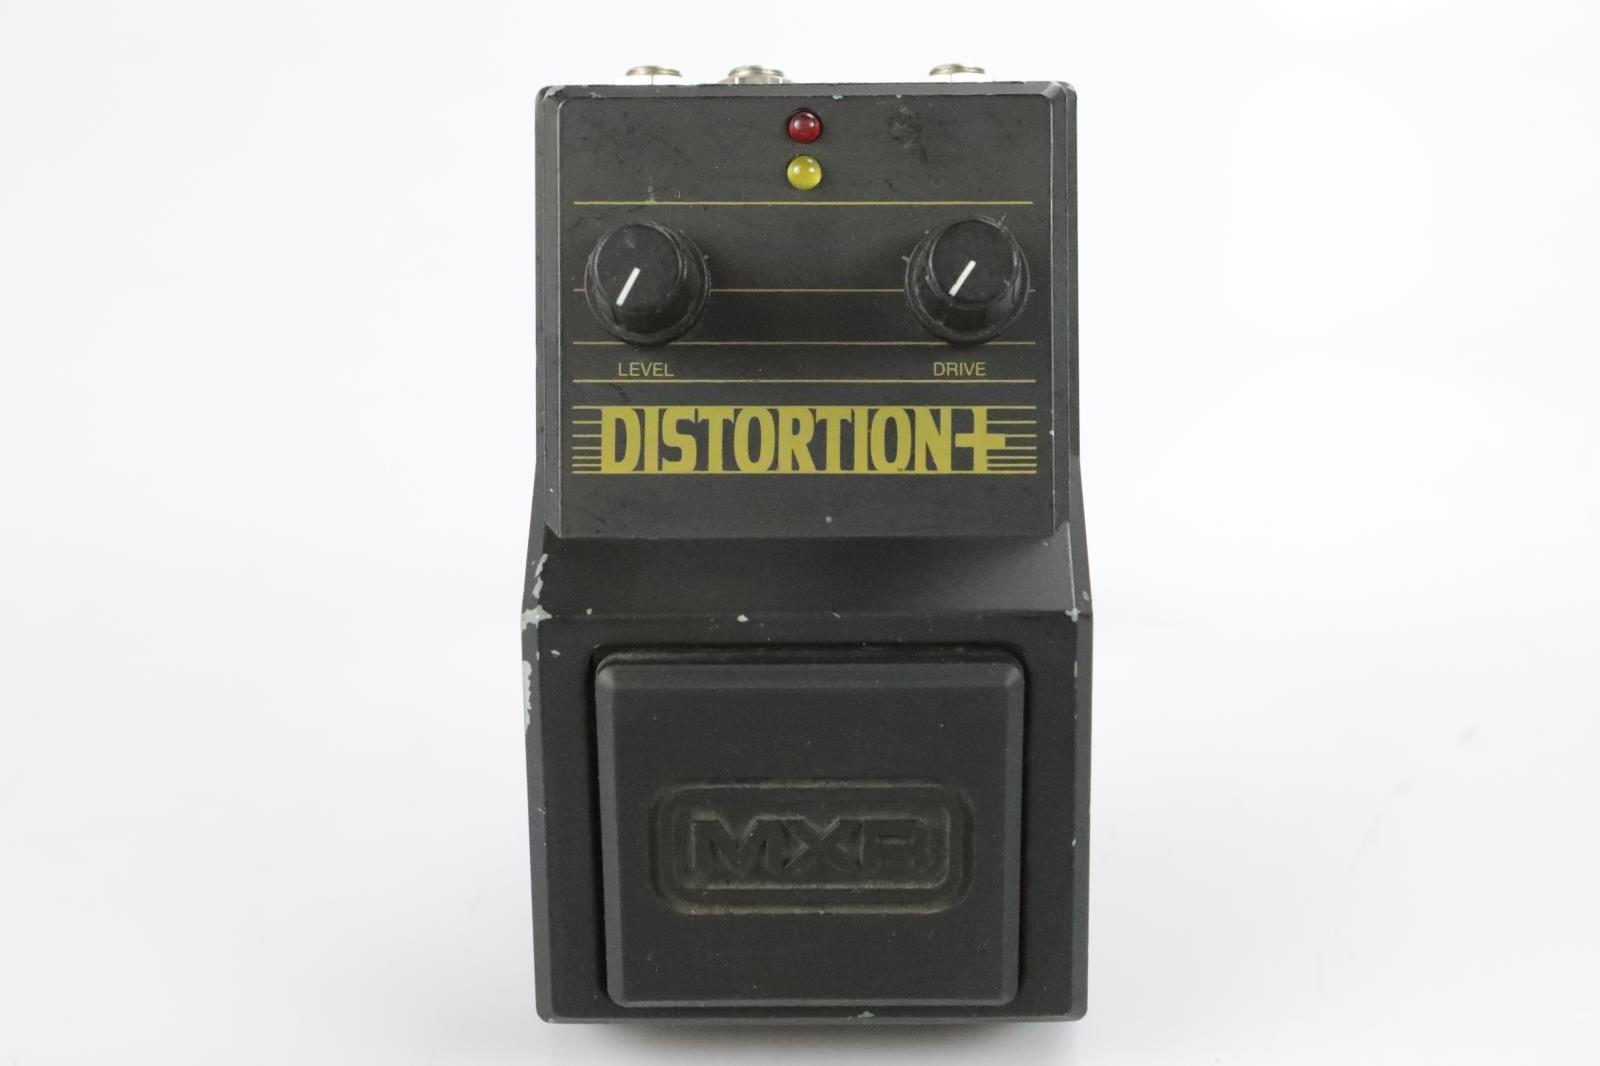 MXR Series 2000 Distortion+ Distortion Plus + Signed Bruce Kulick Kiss #34411